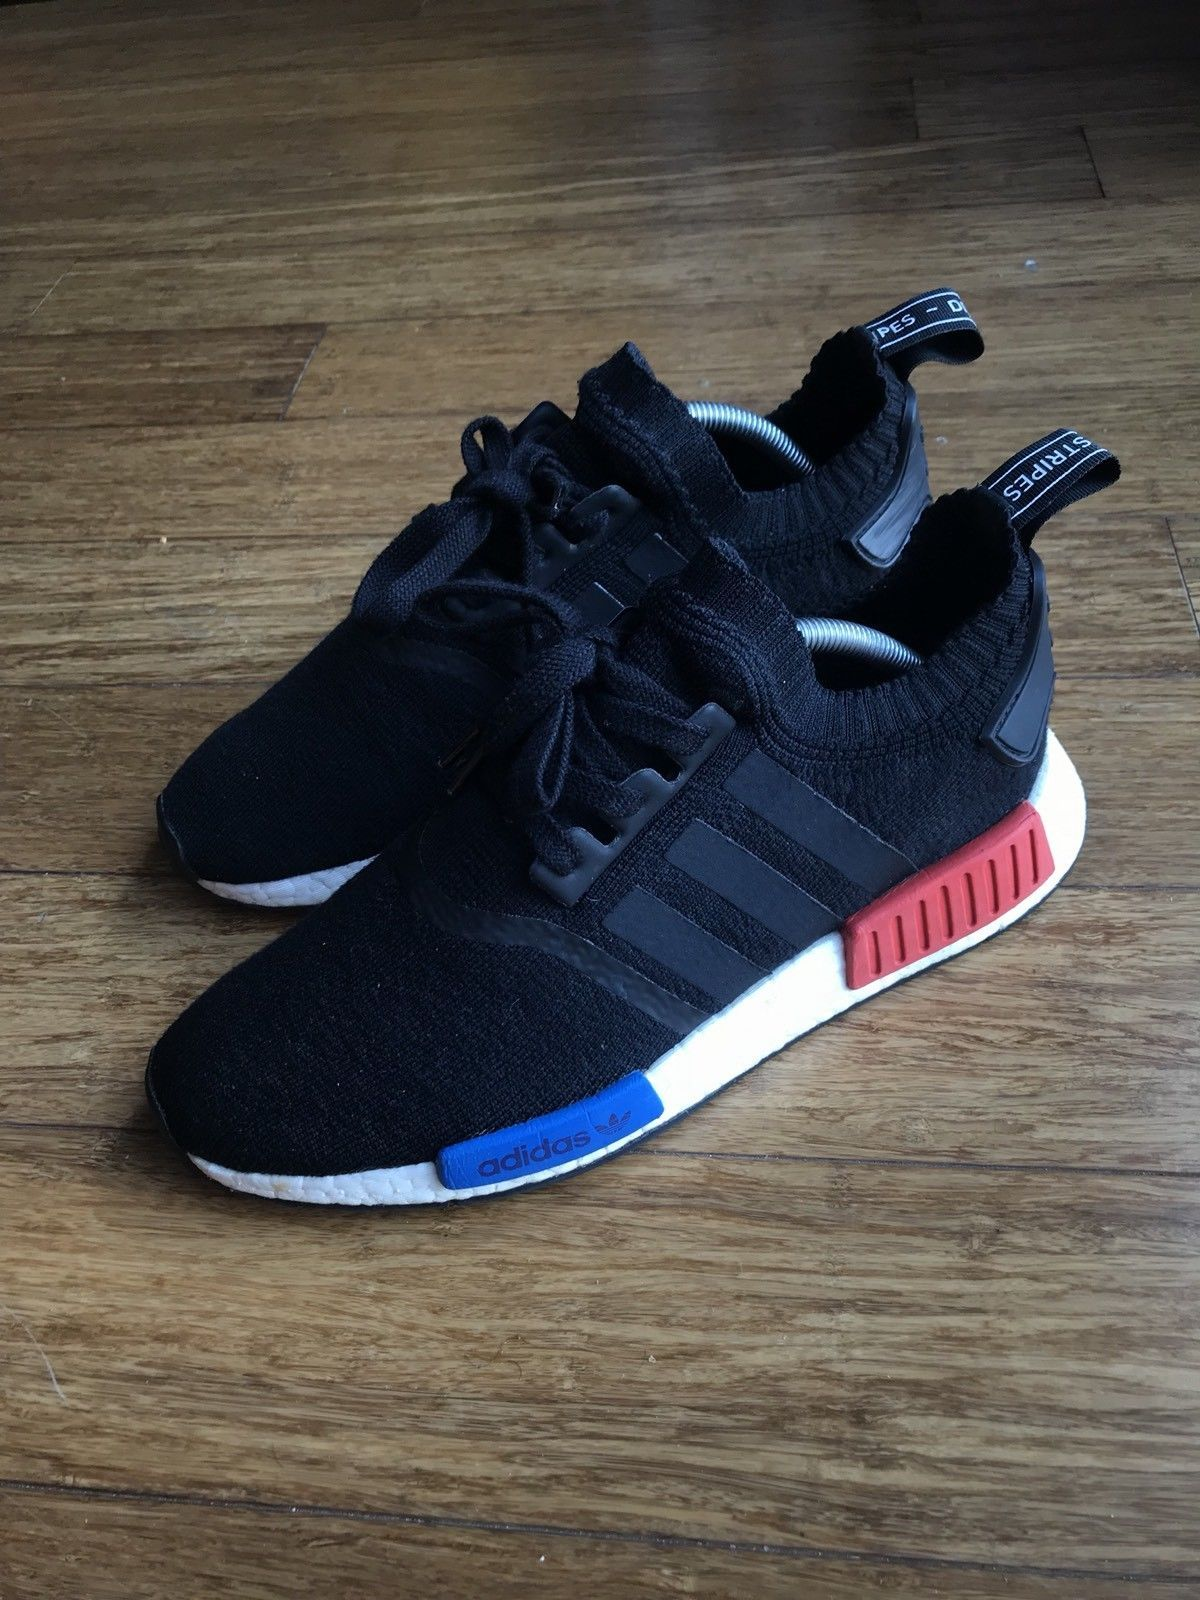 Adidas Men NMD R1 Primeknit Black Blue Red Casual Shoes Sz 9 ... b56df3cd10